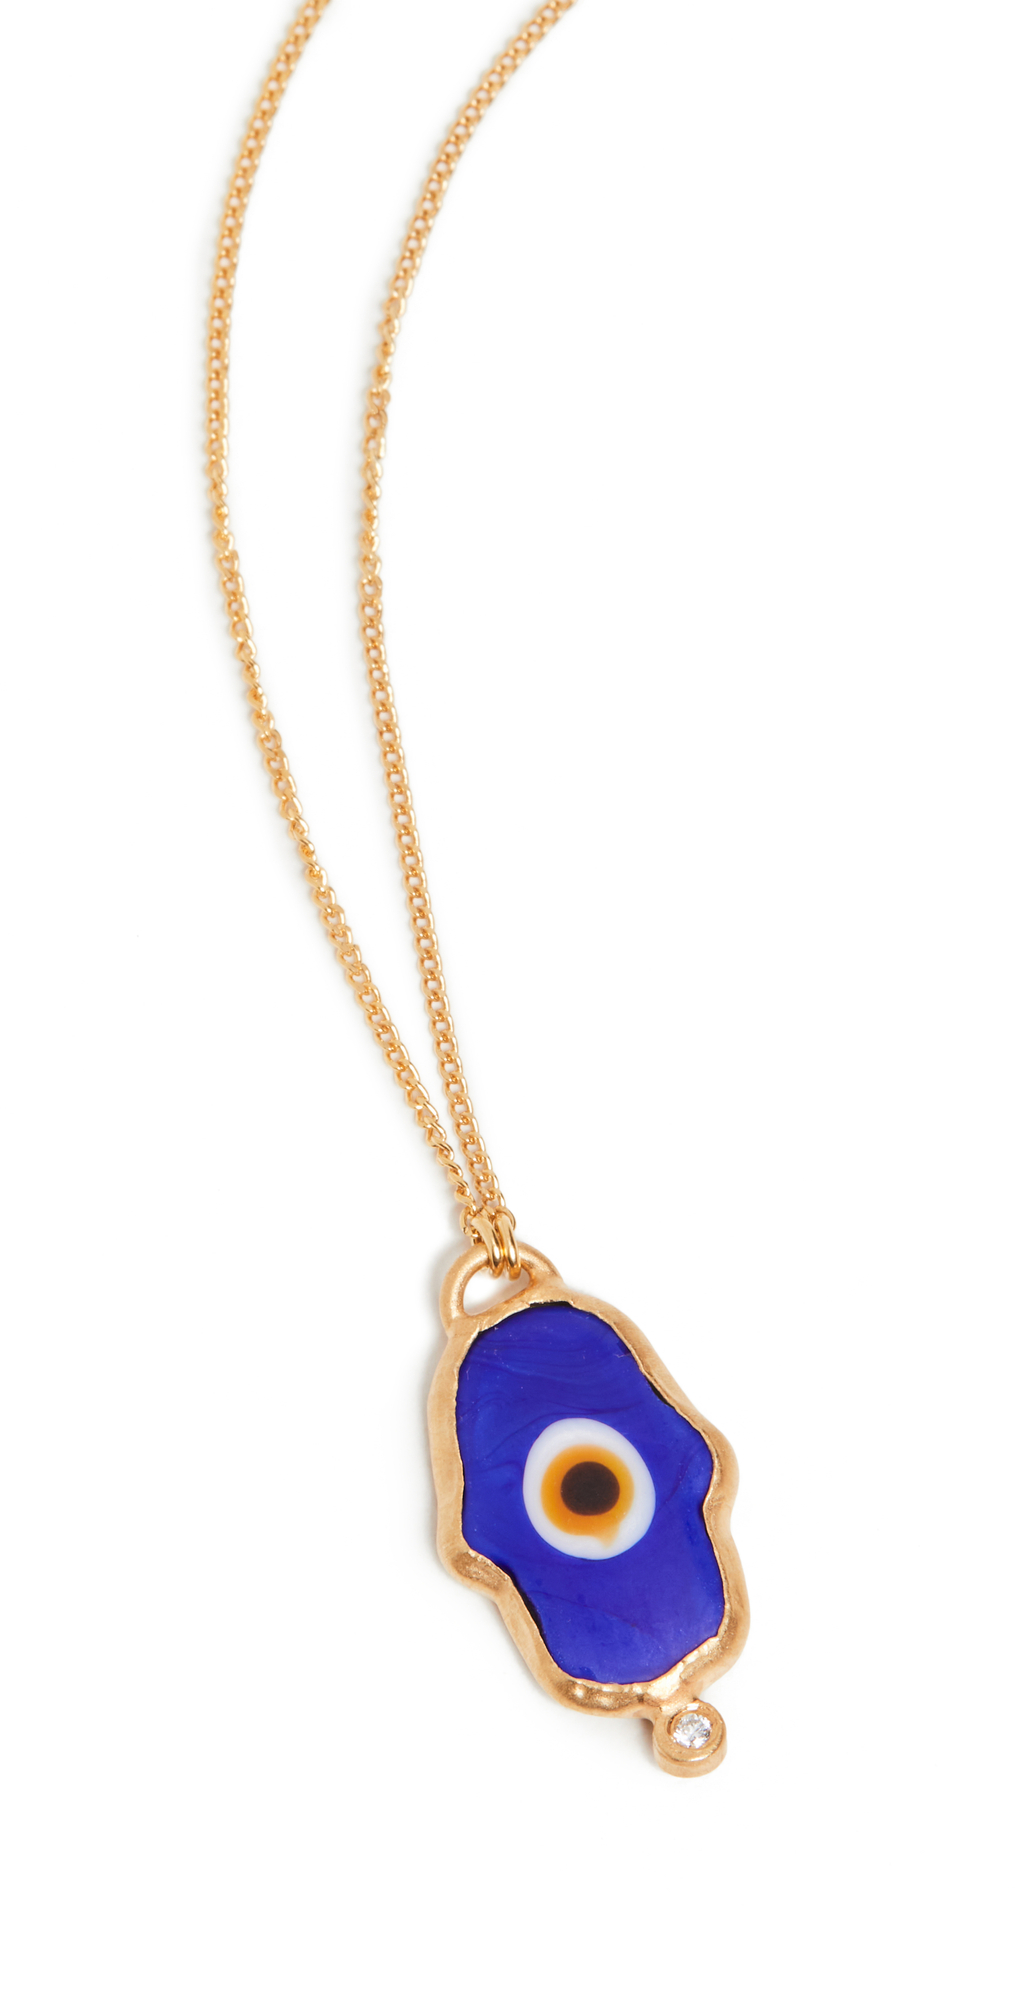 Samsa Hand Pendant Necklace